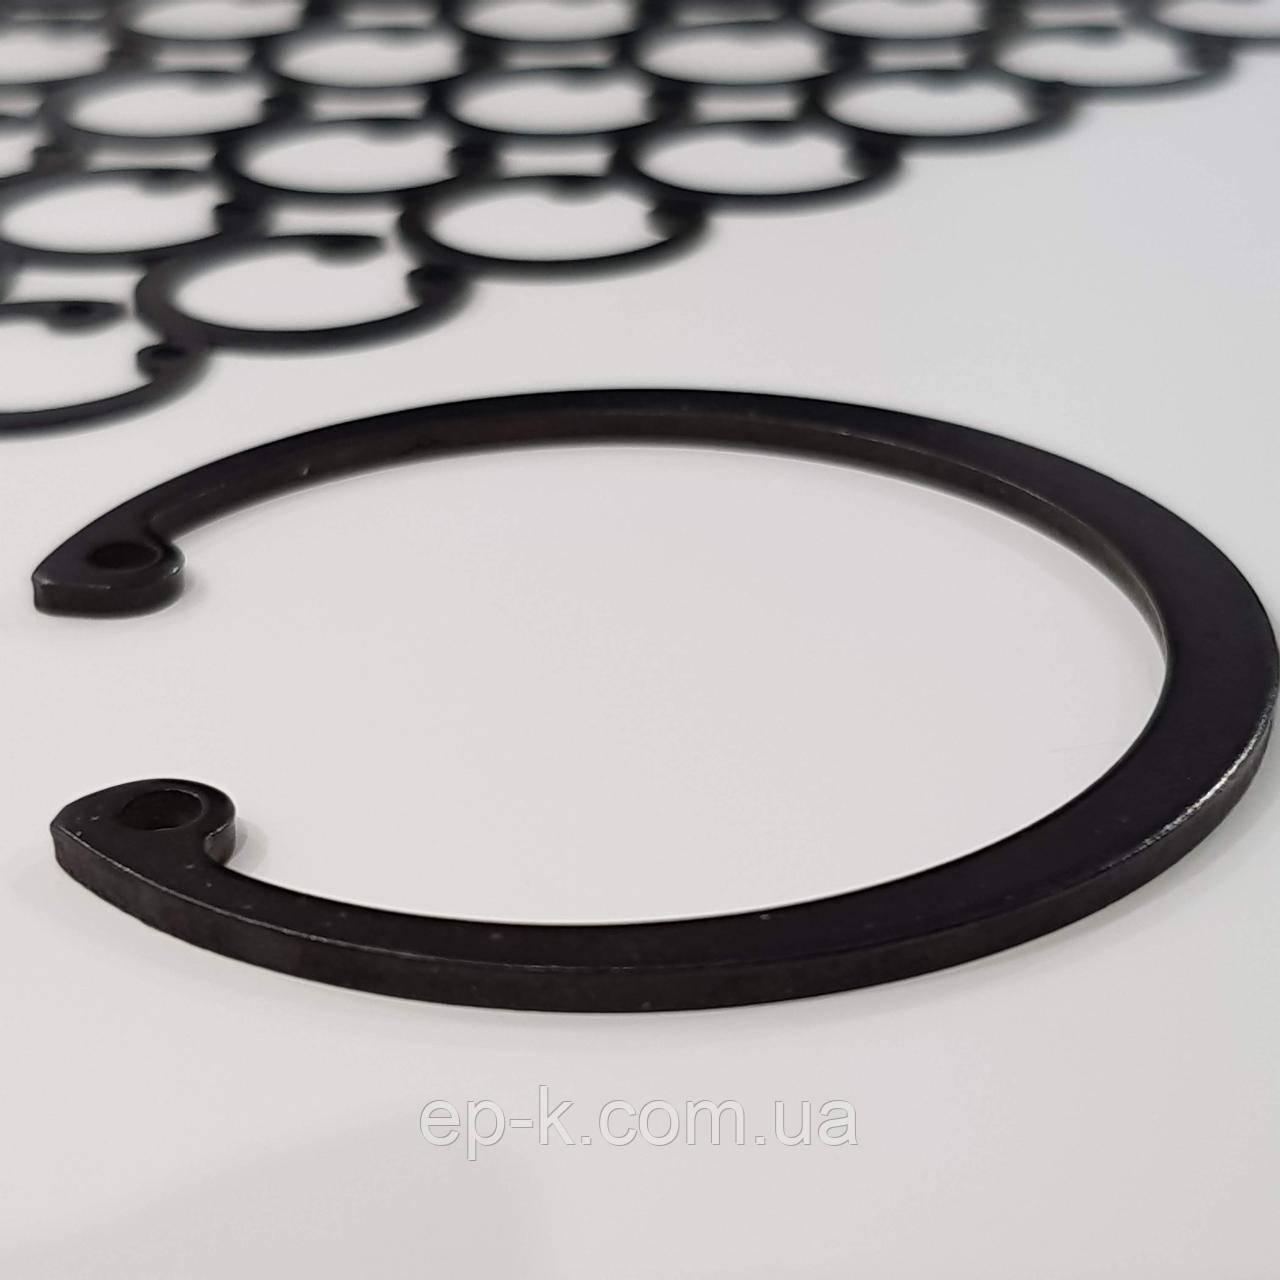 Стопорное кольцо внутреннее А175  ГОСТ 13943-86, DIN 472